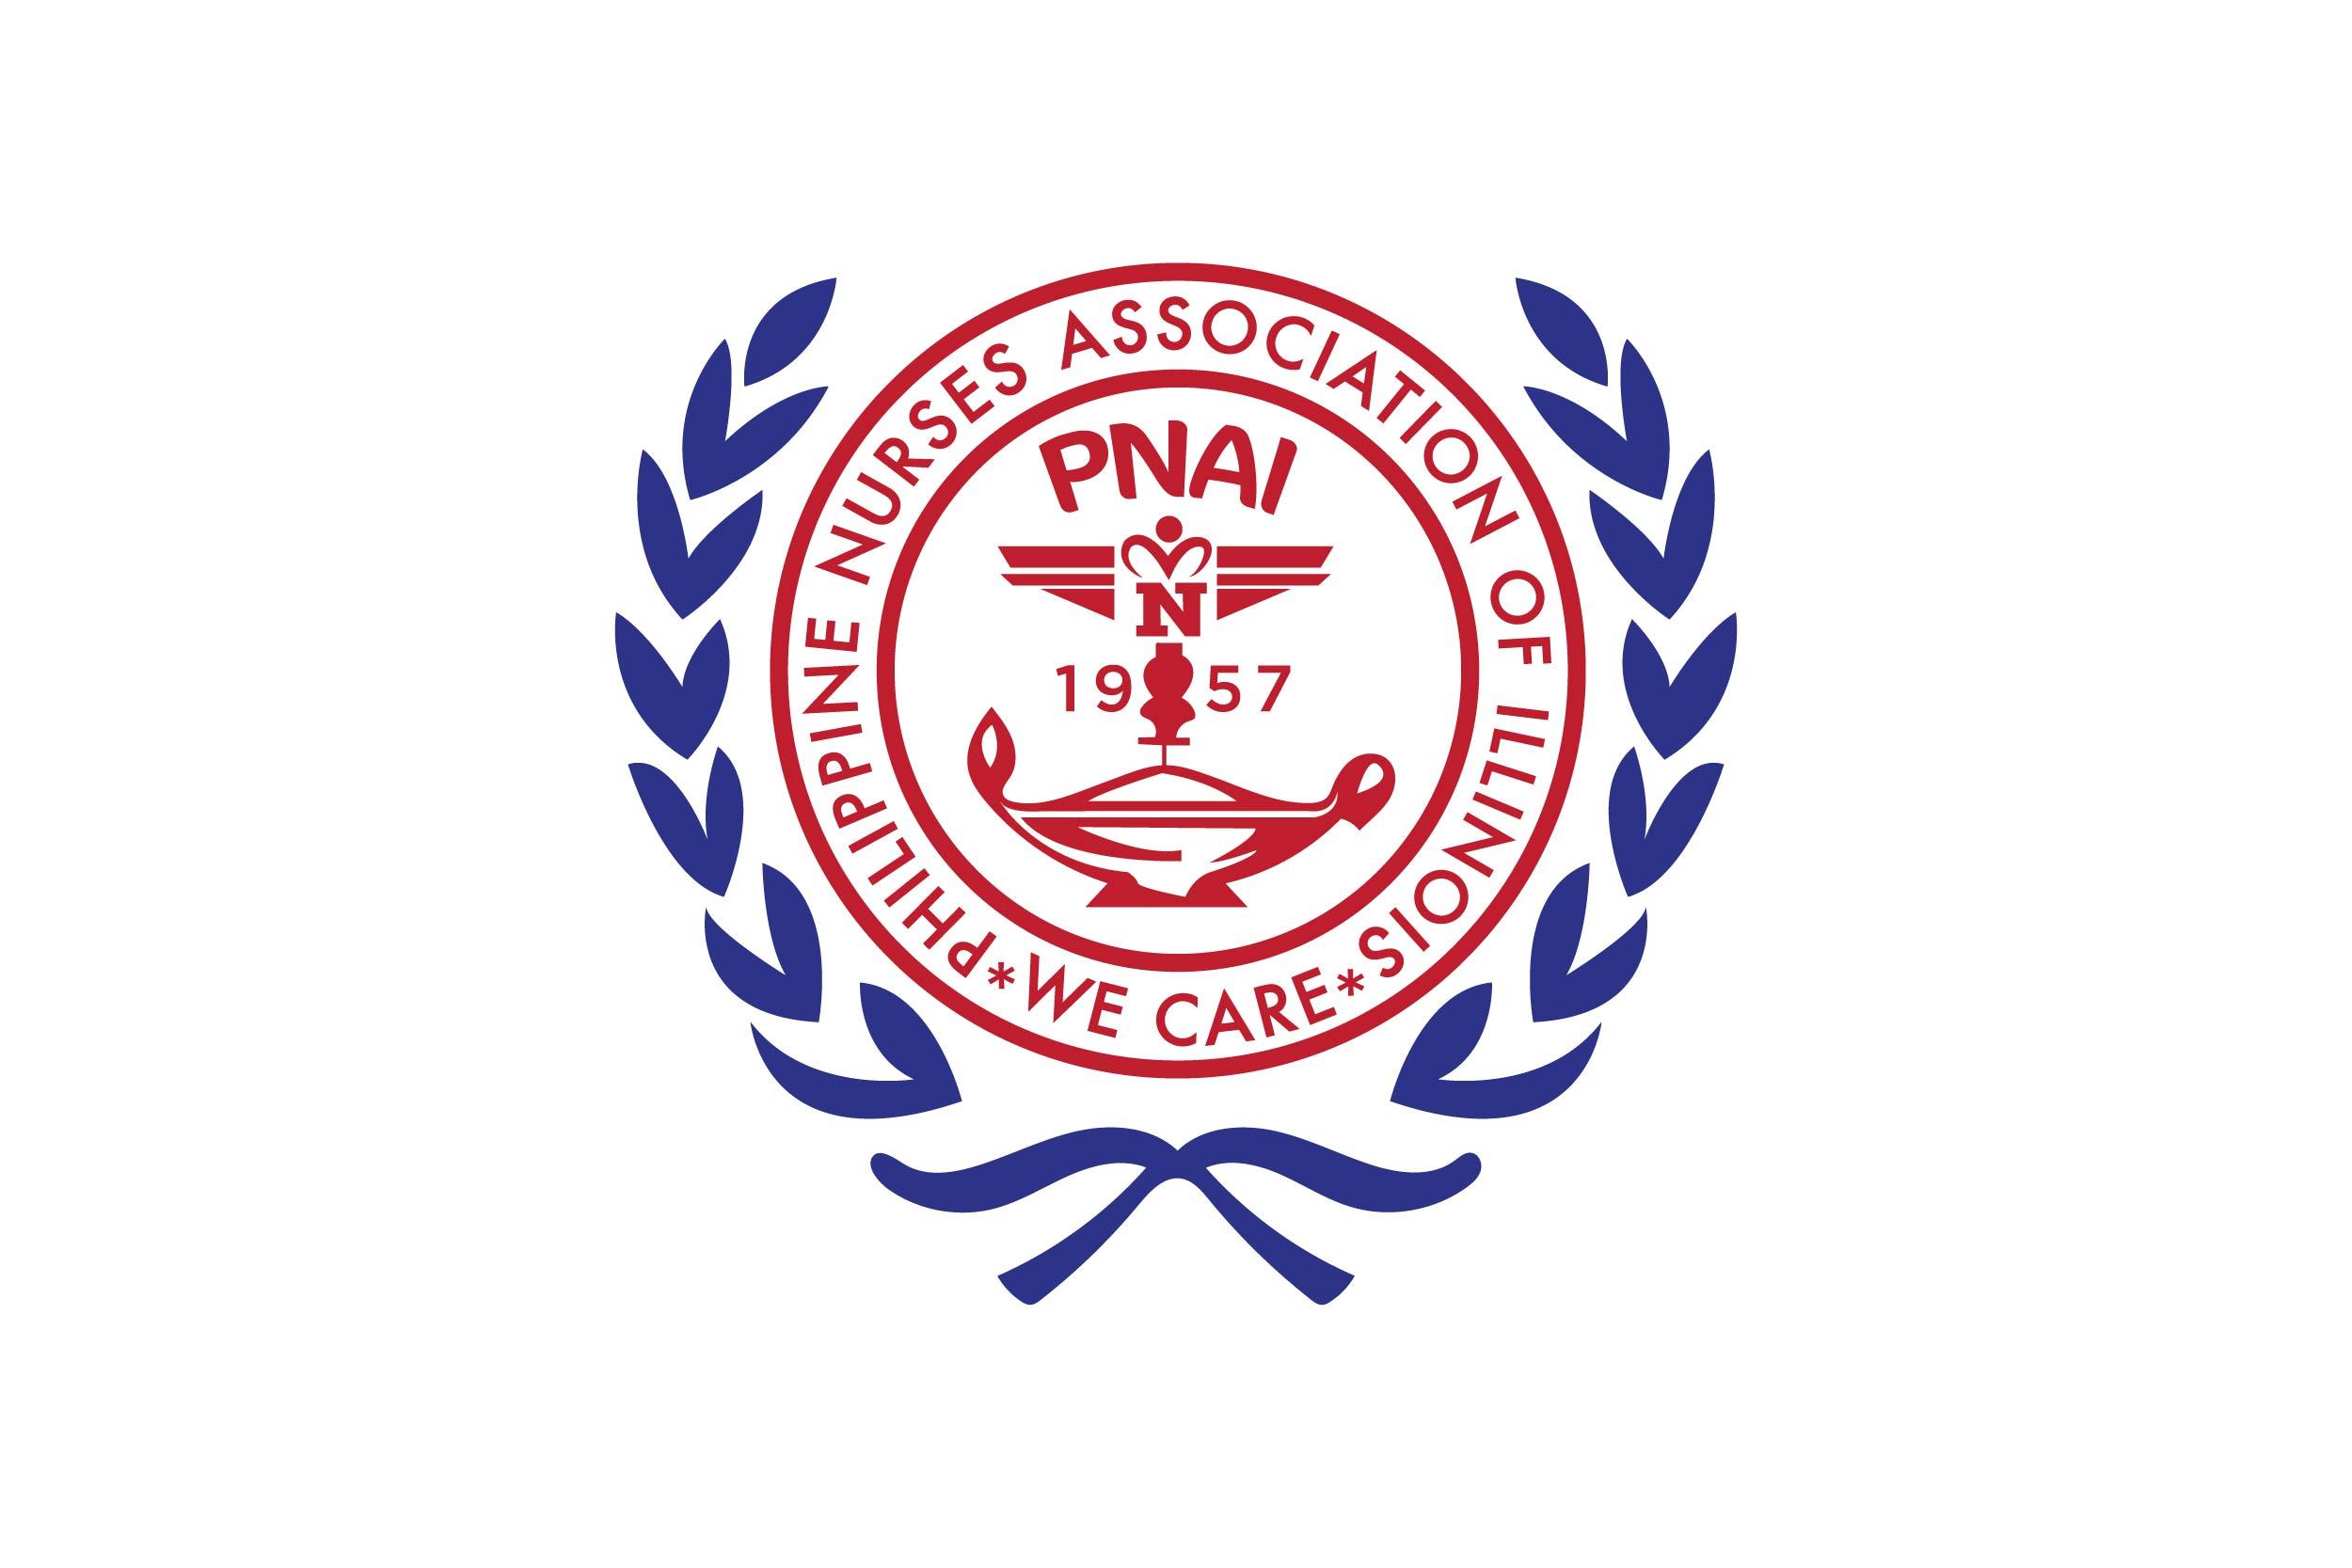 The Philippine Nurses Association of Illinois (PNAI) logo